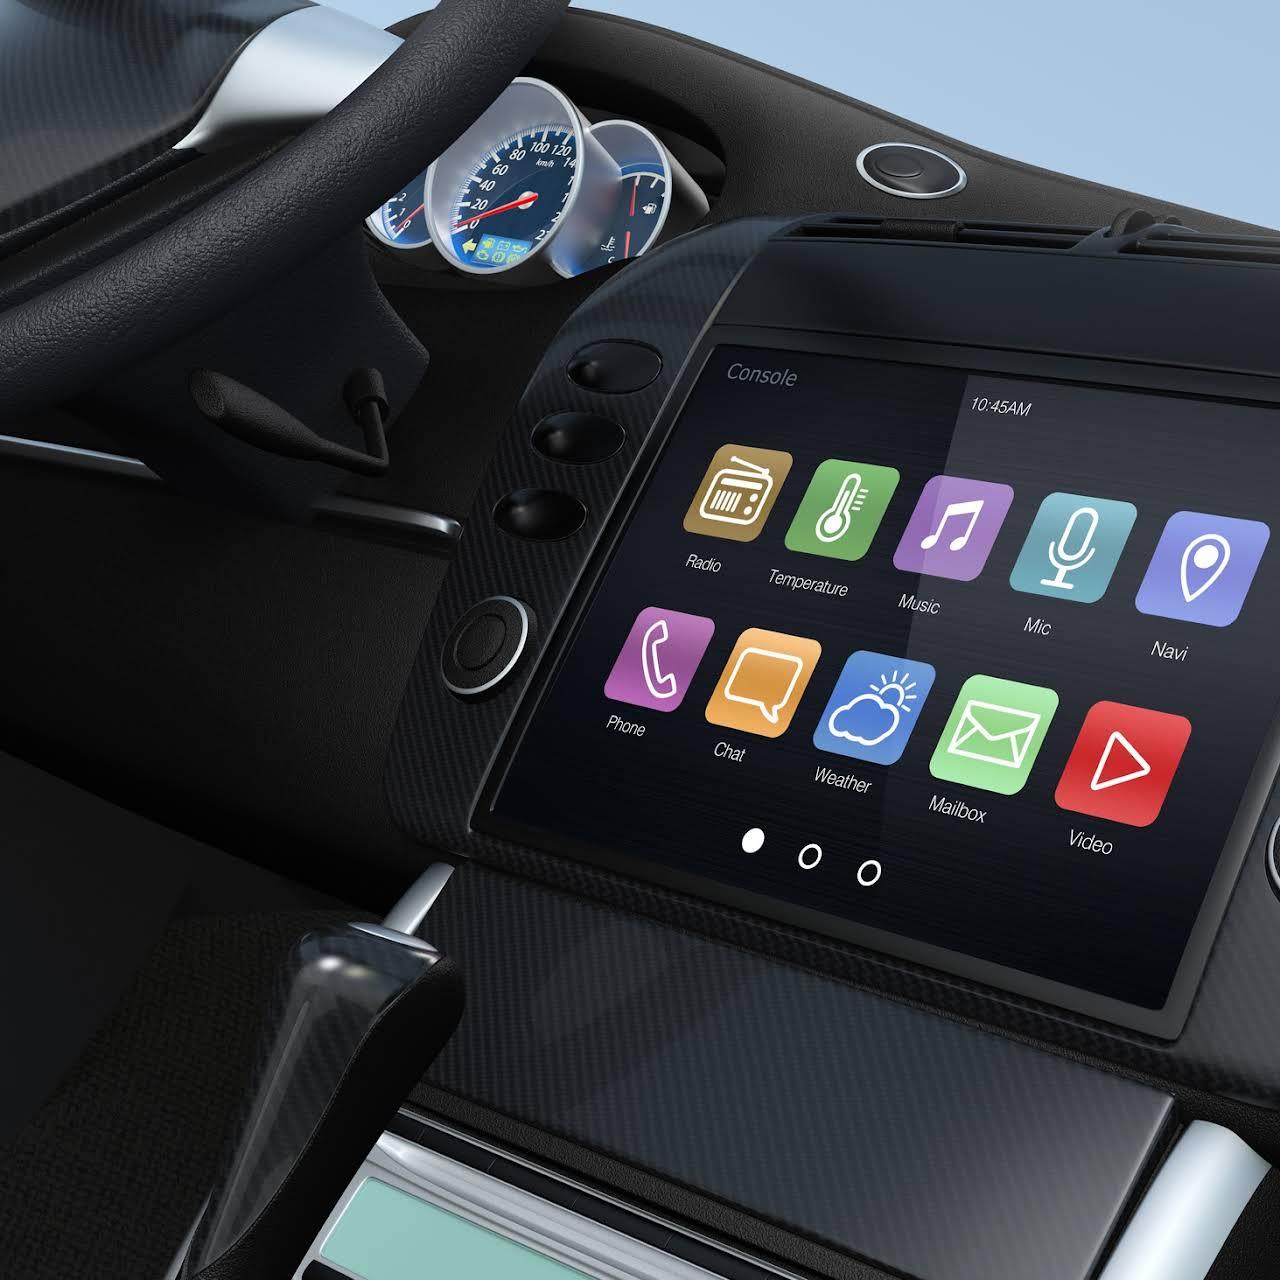 Northwest Car Audio Connection | Affordable Car Audio System